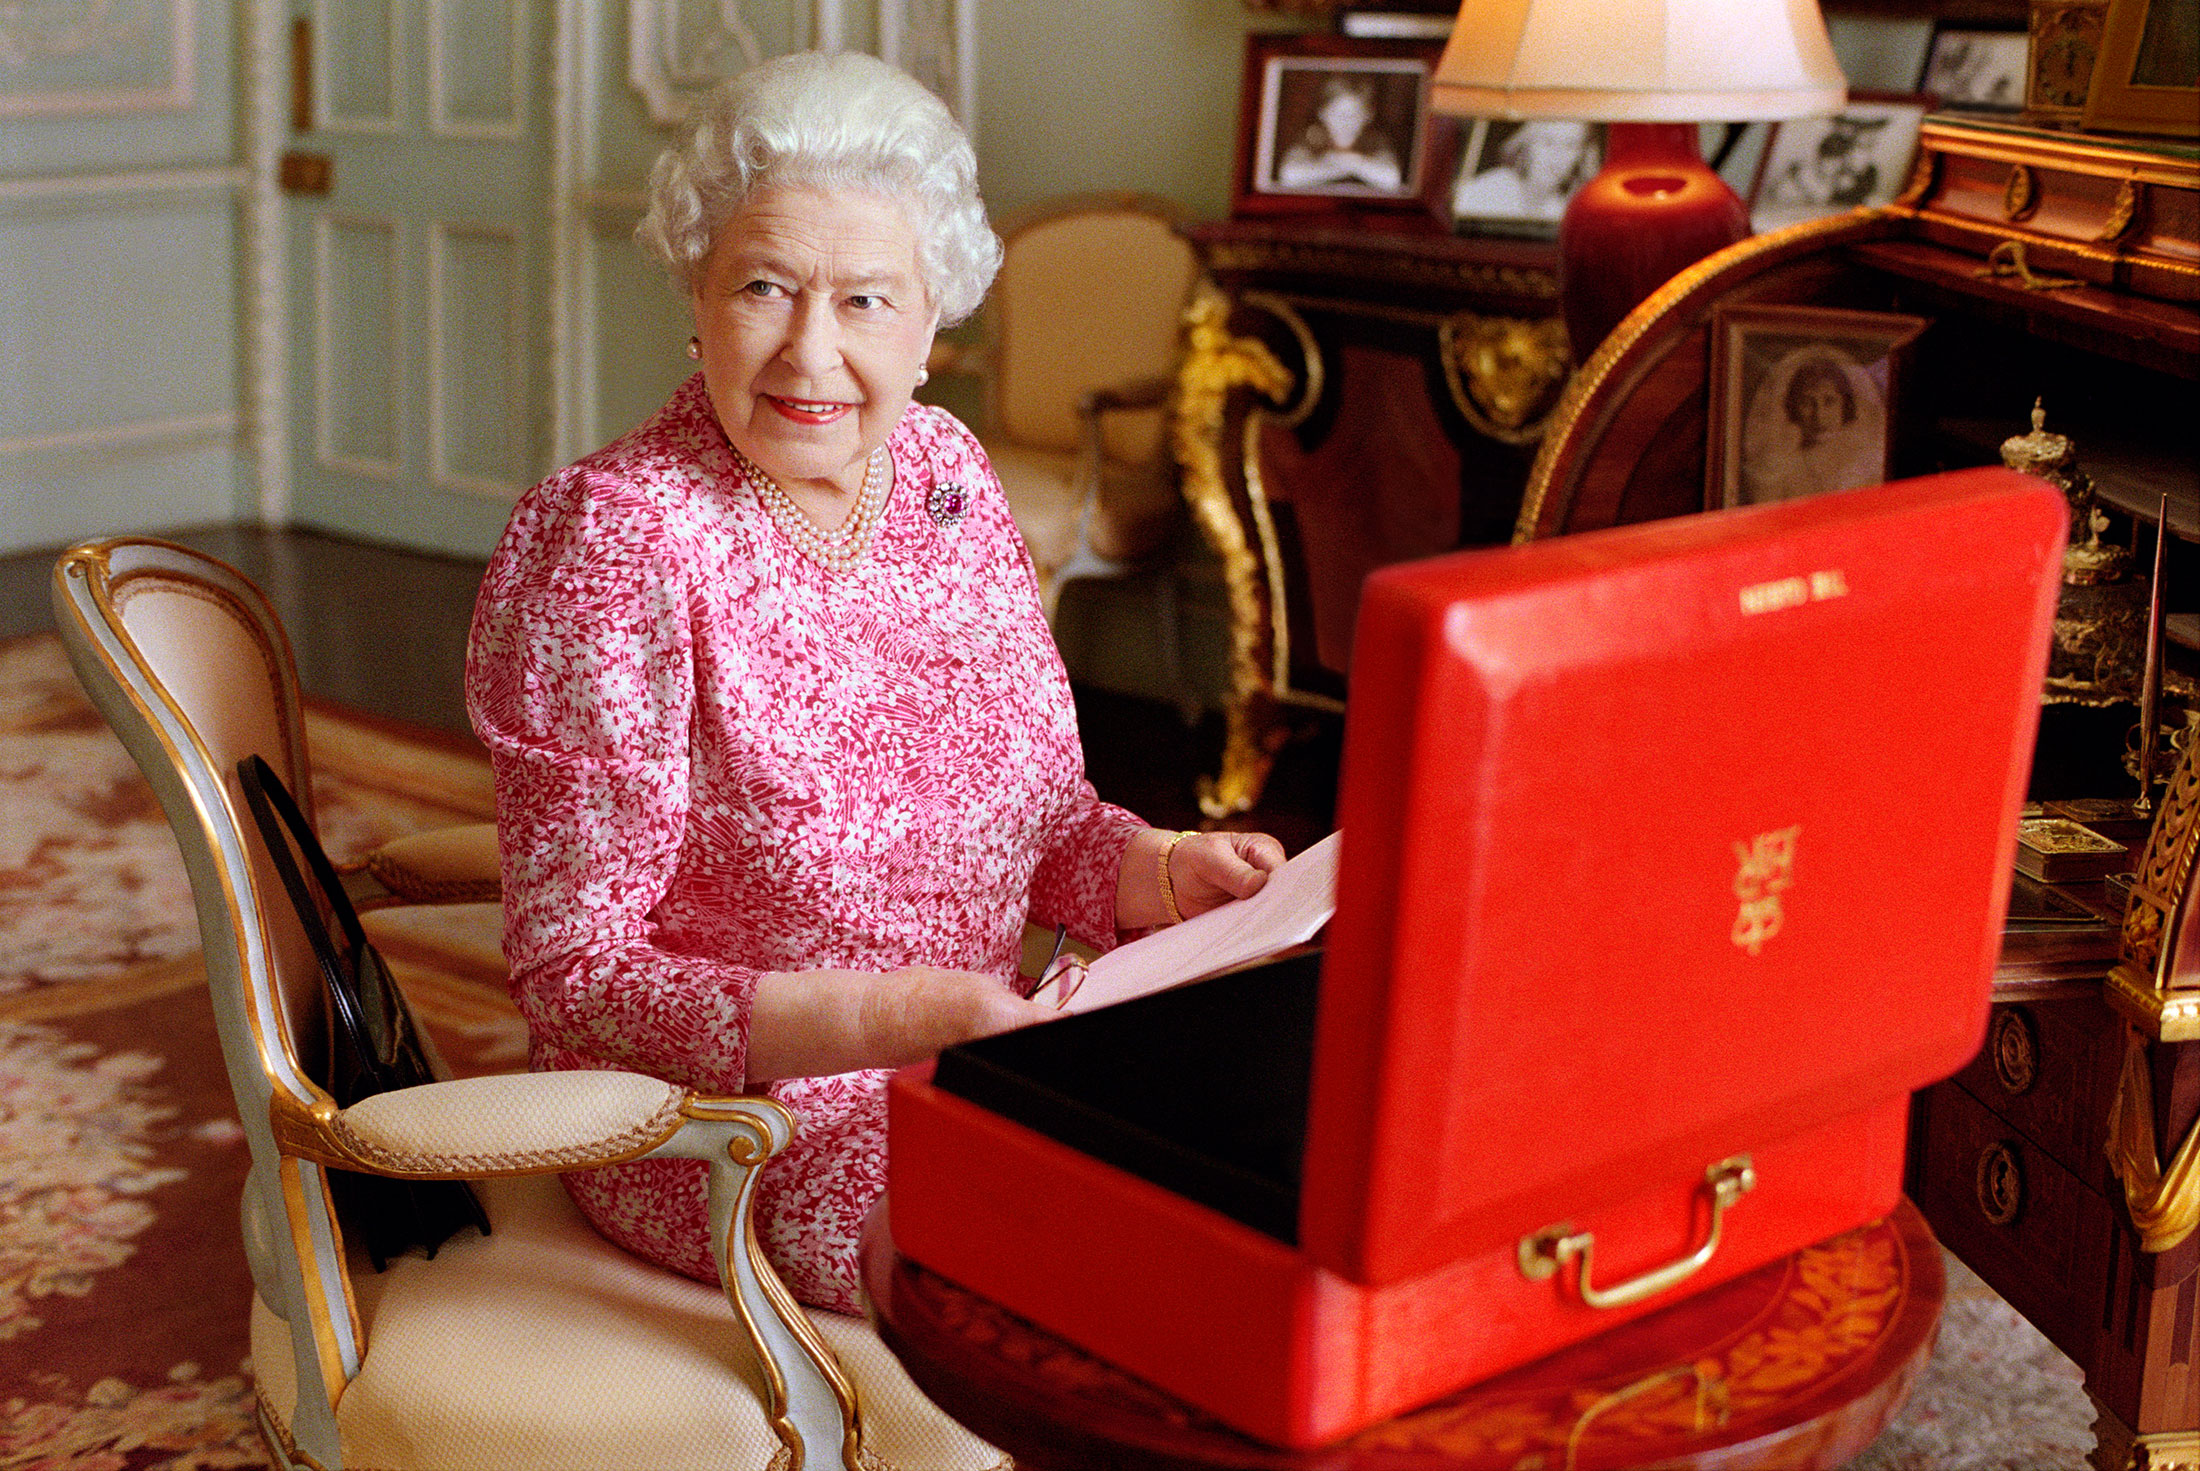 Research paper ideas..queen elizabeth?